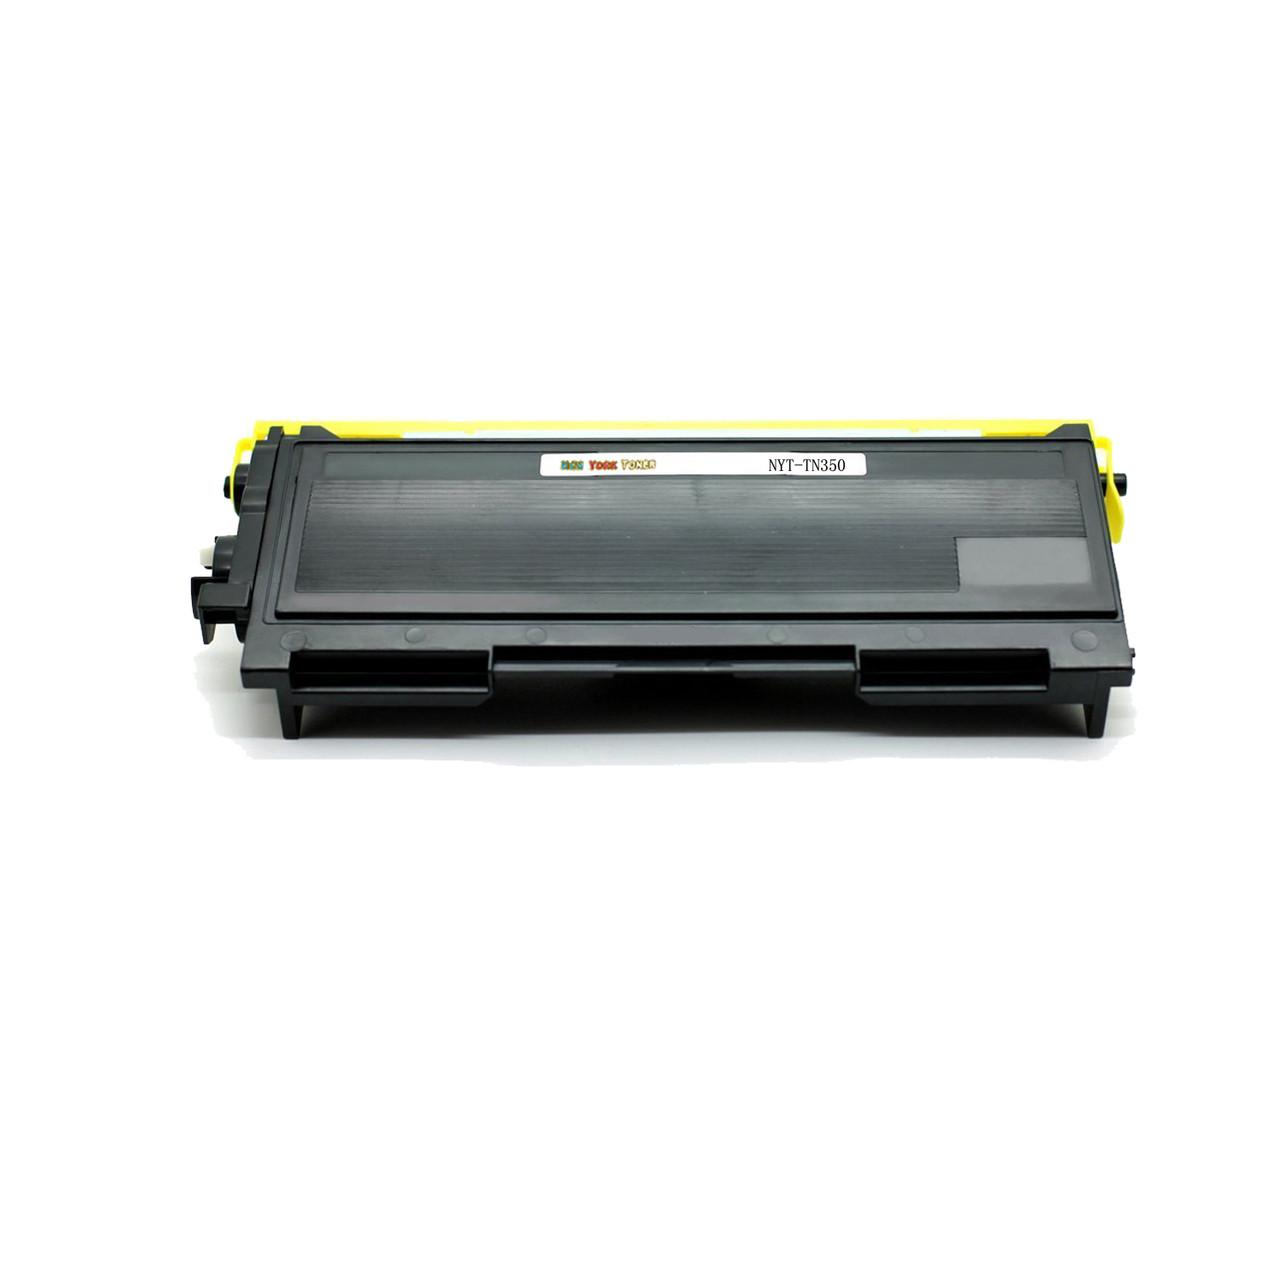 Toner Cartridge Black Compatible for Brother TN350 TN-350 MFC-7220 7820N Printer